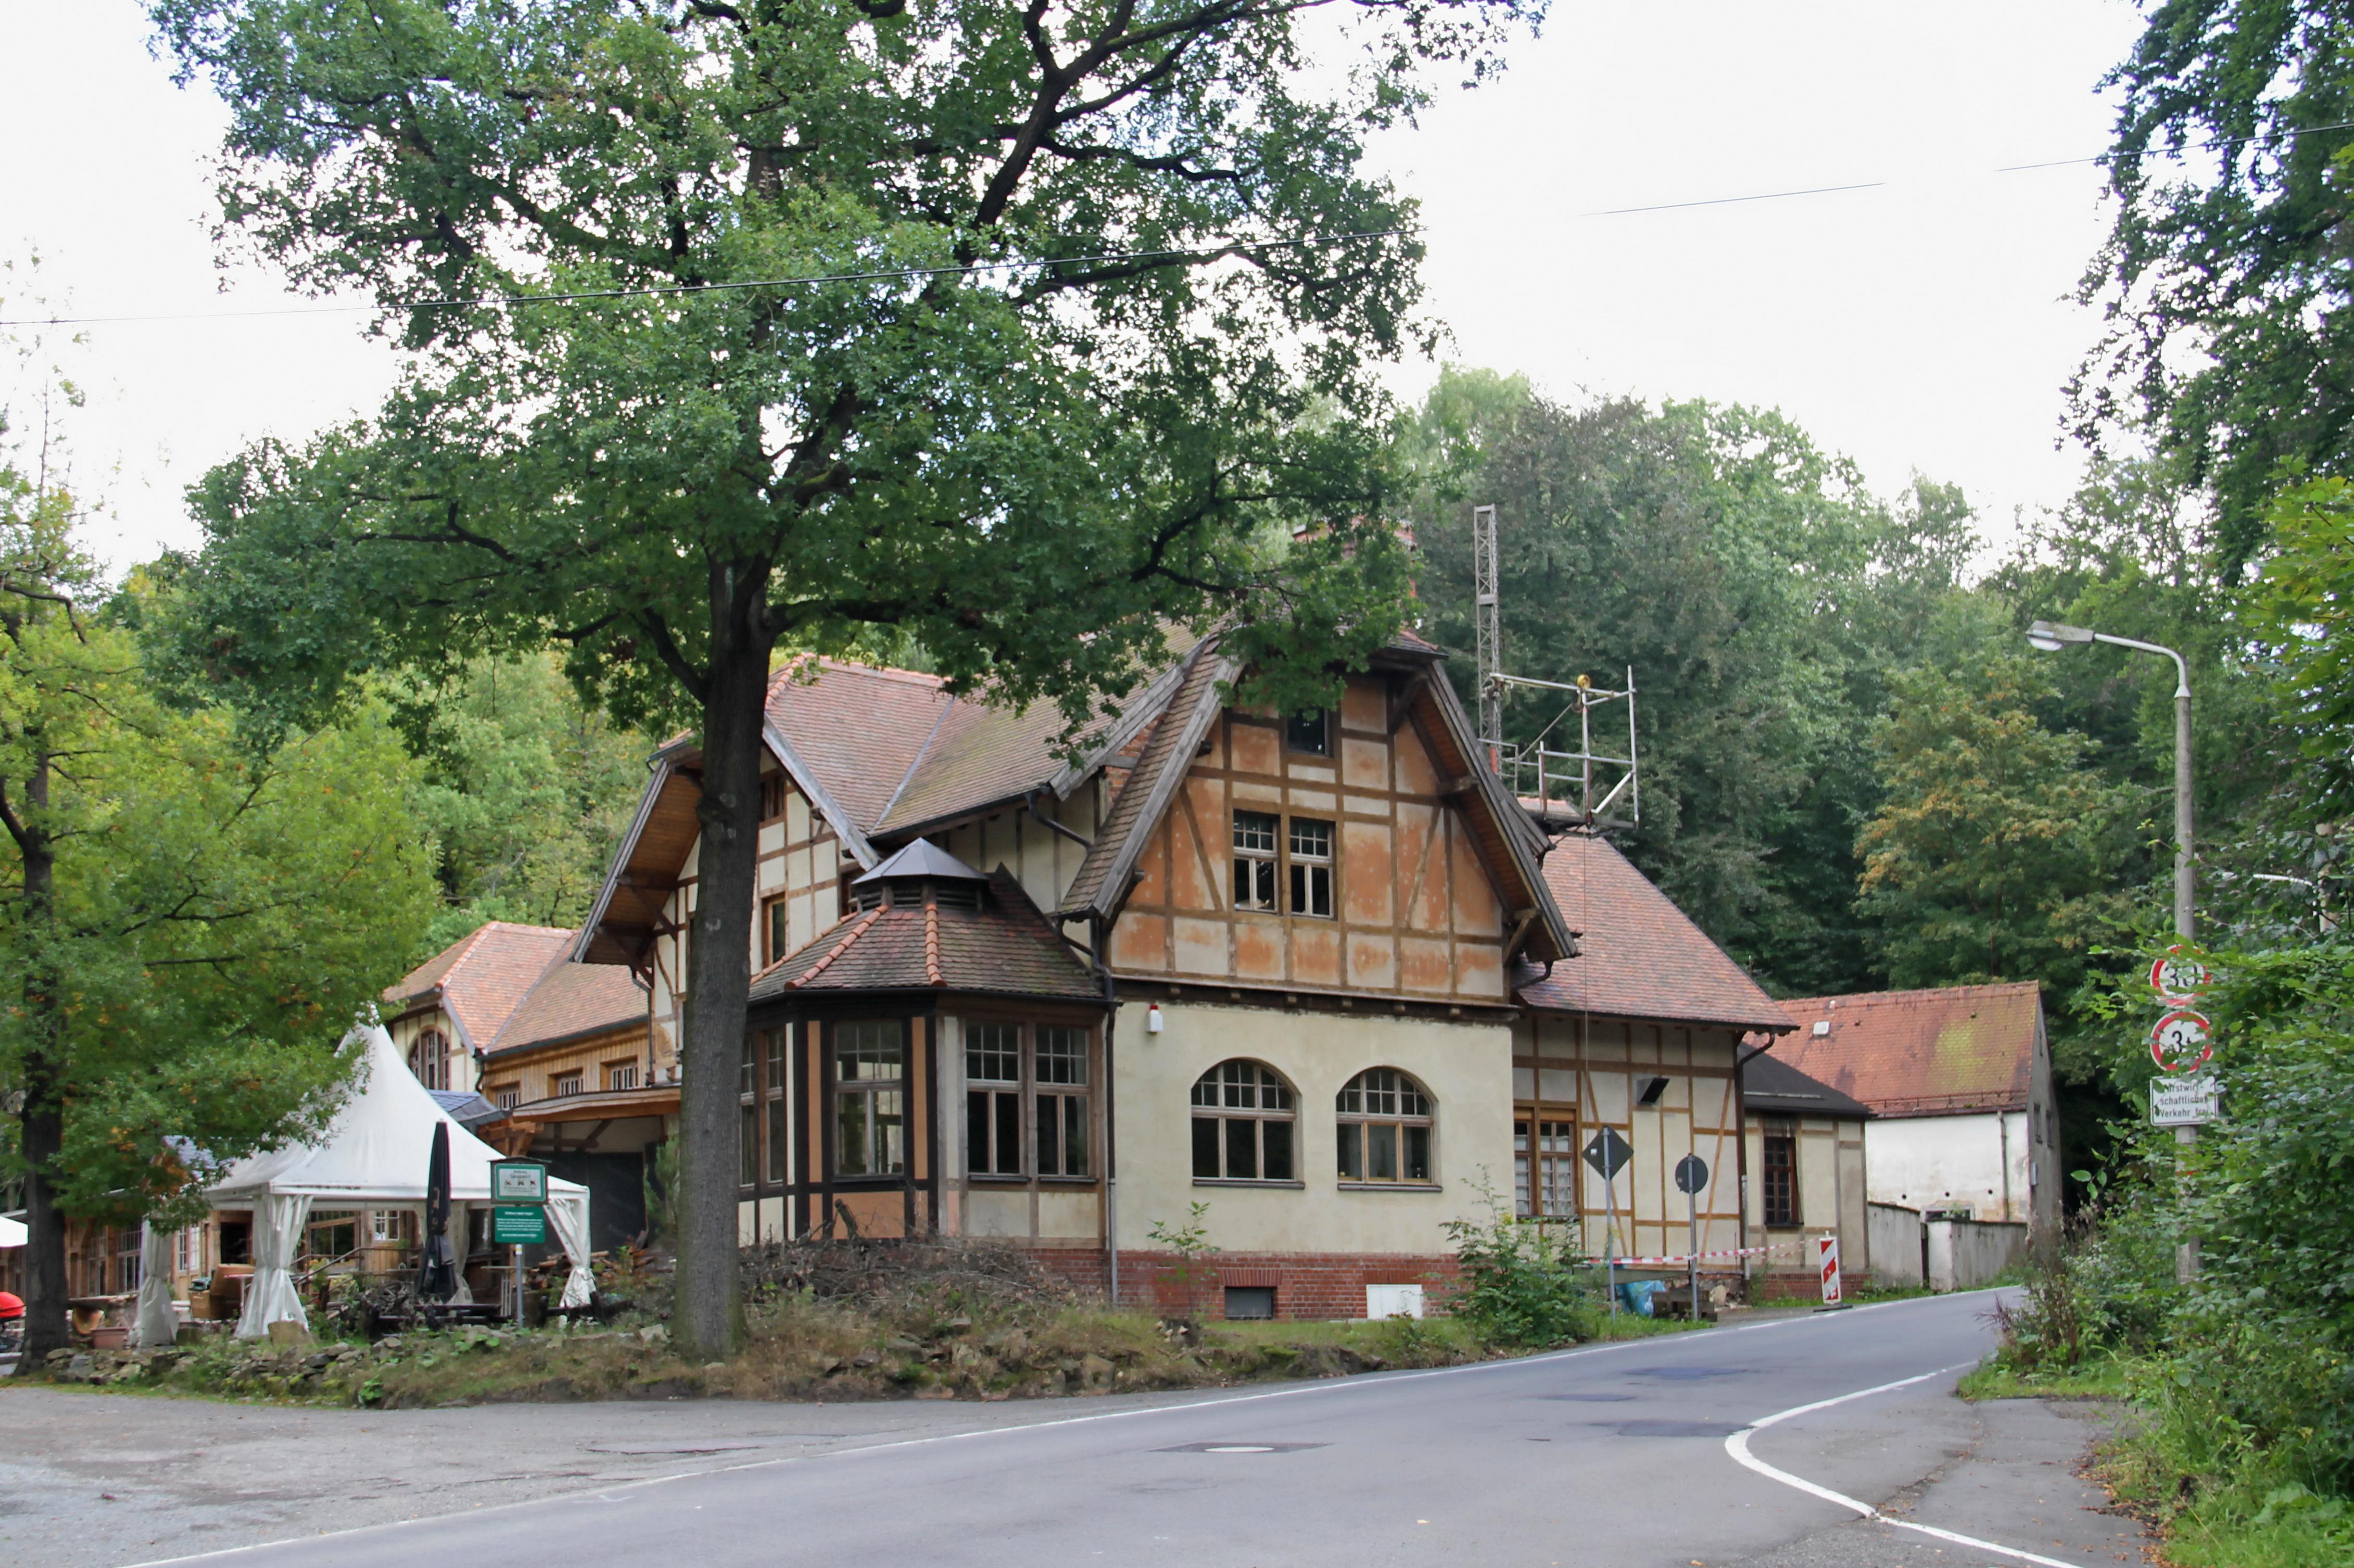 Datei:Zeisigwald Zeisigwaldschänke LvT.JPG – Wikipedia